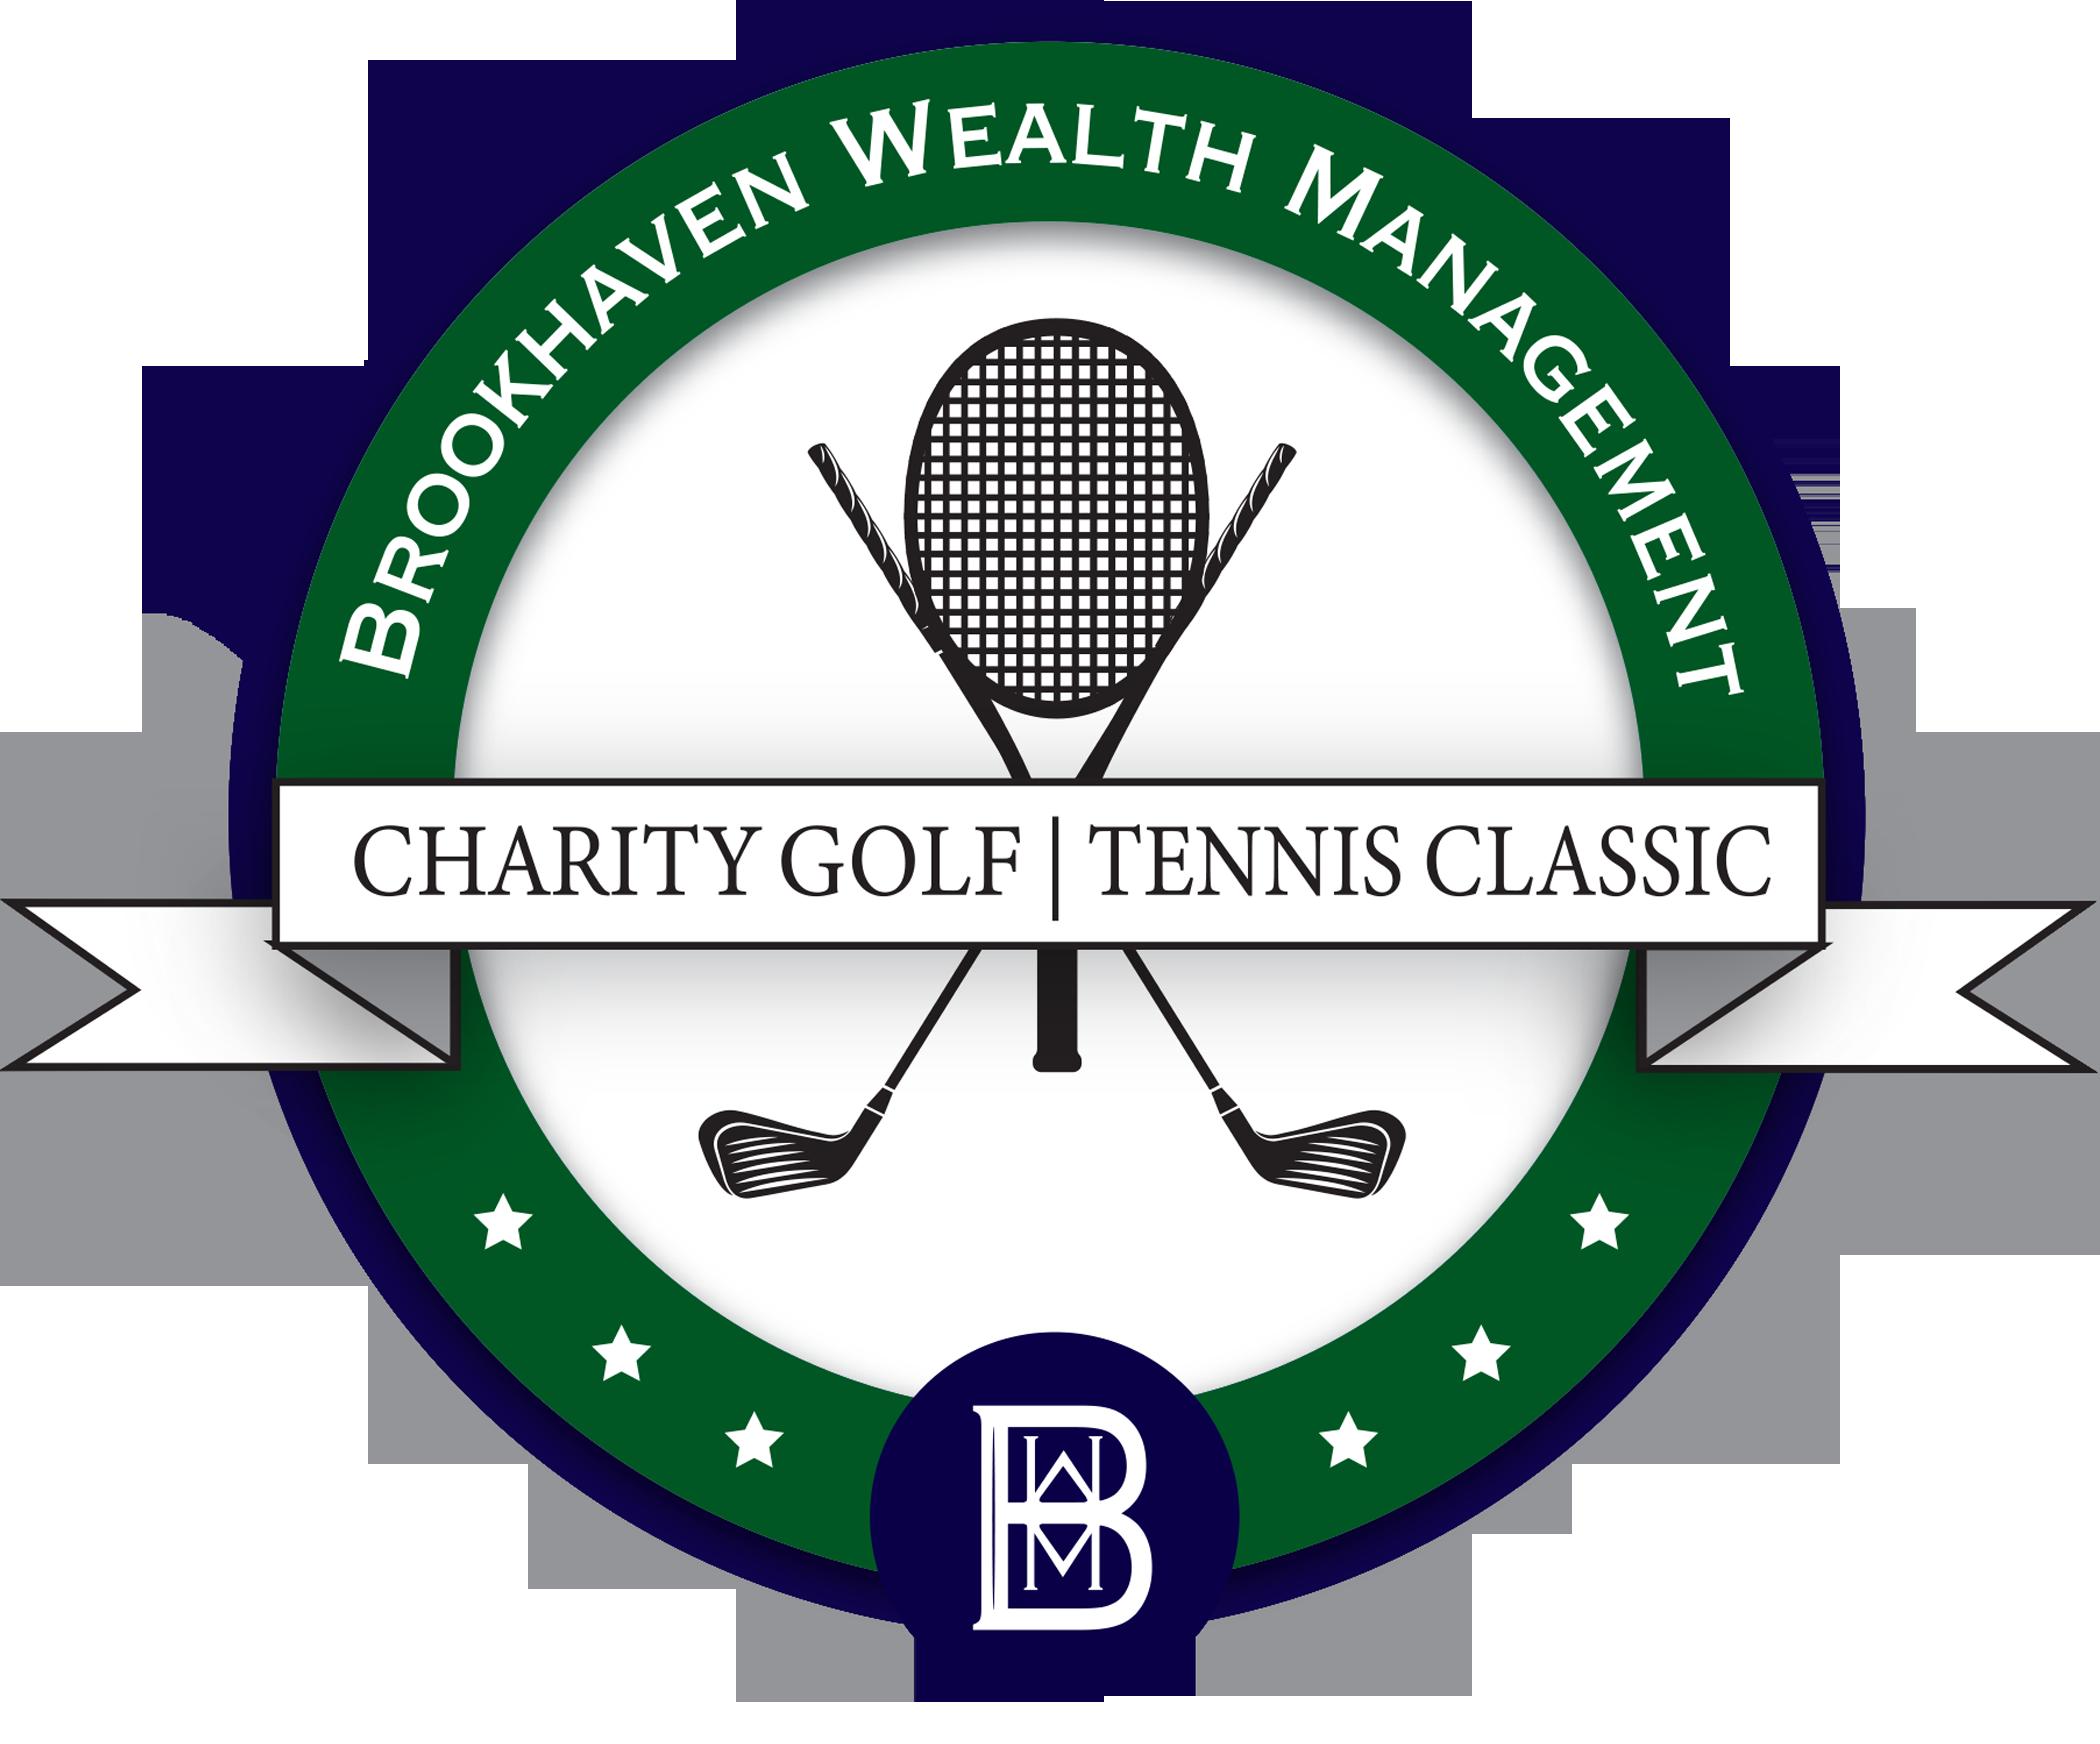 Brookhaven Wealth Management Charity Golf|Tennis Classic & Fundraiser logo